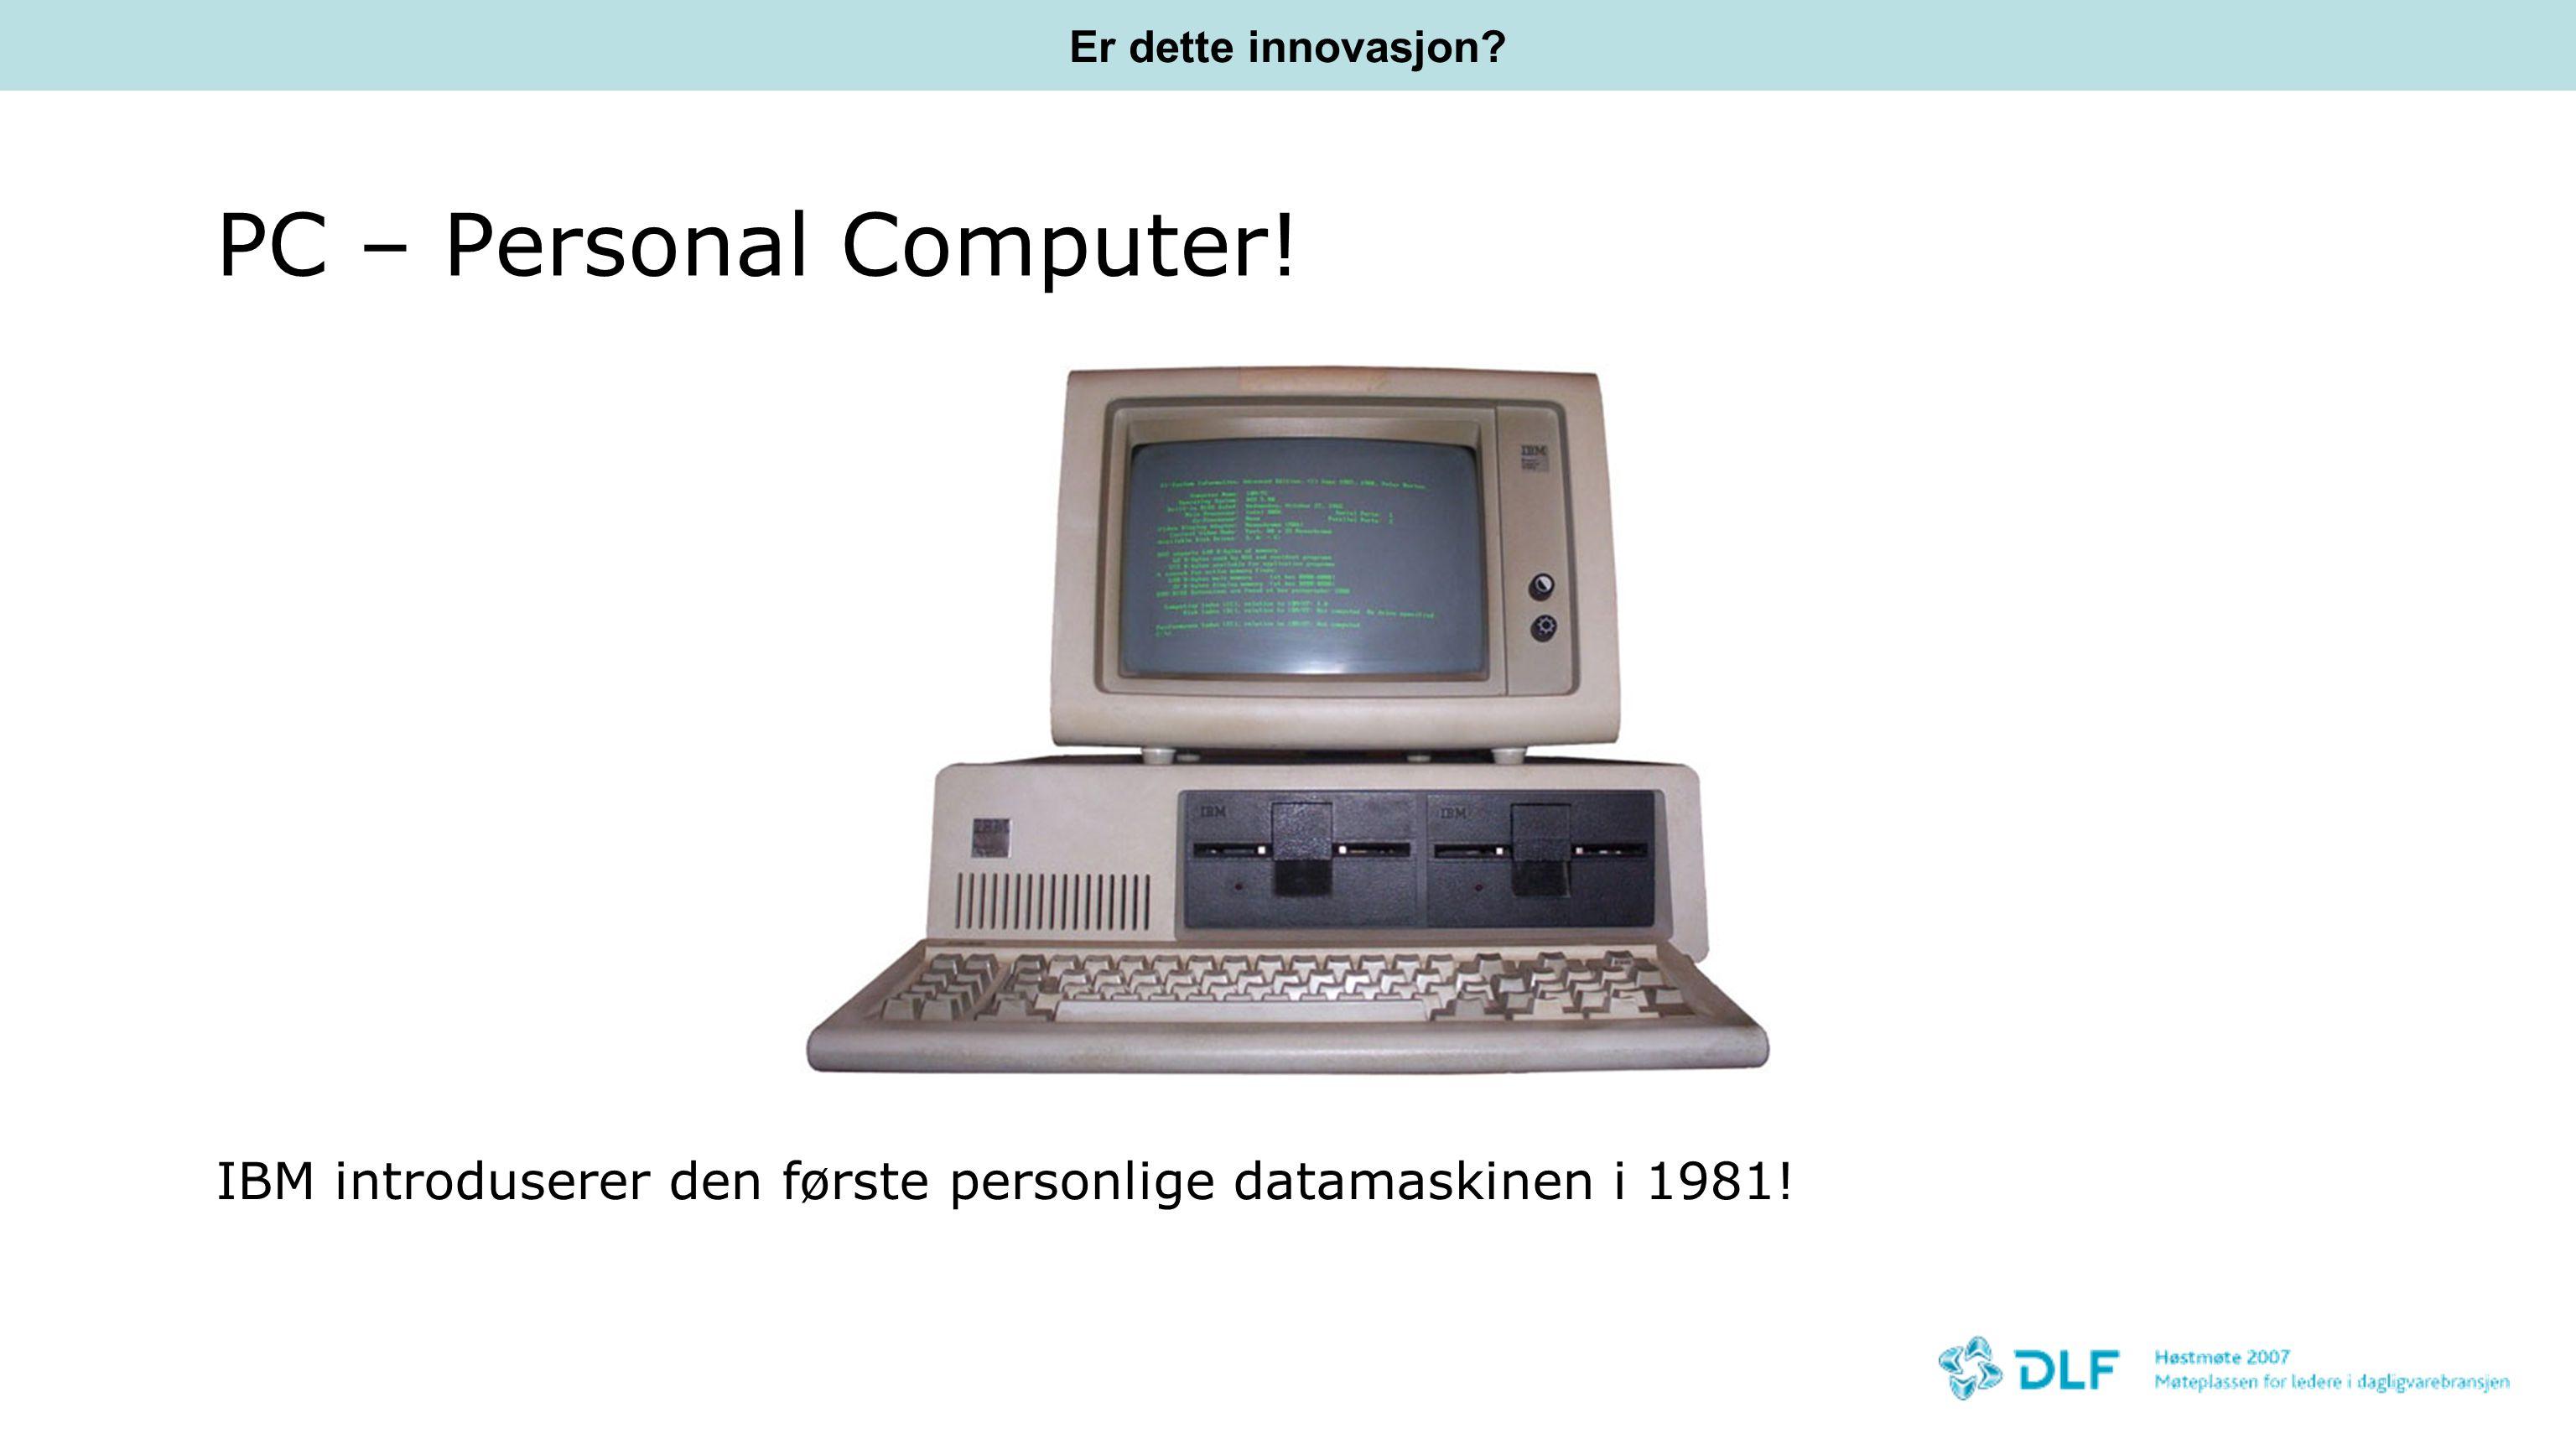 PC – Personal Computer.IBM introduserer den første personlige datamaskinen i 1981.